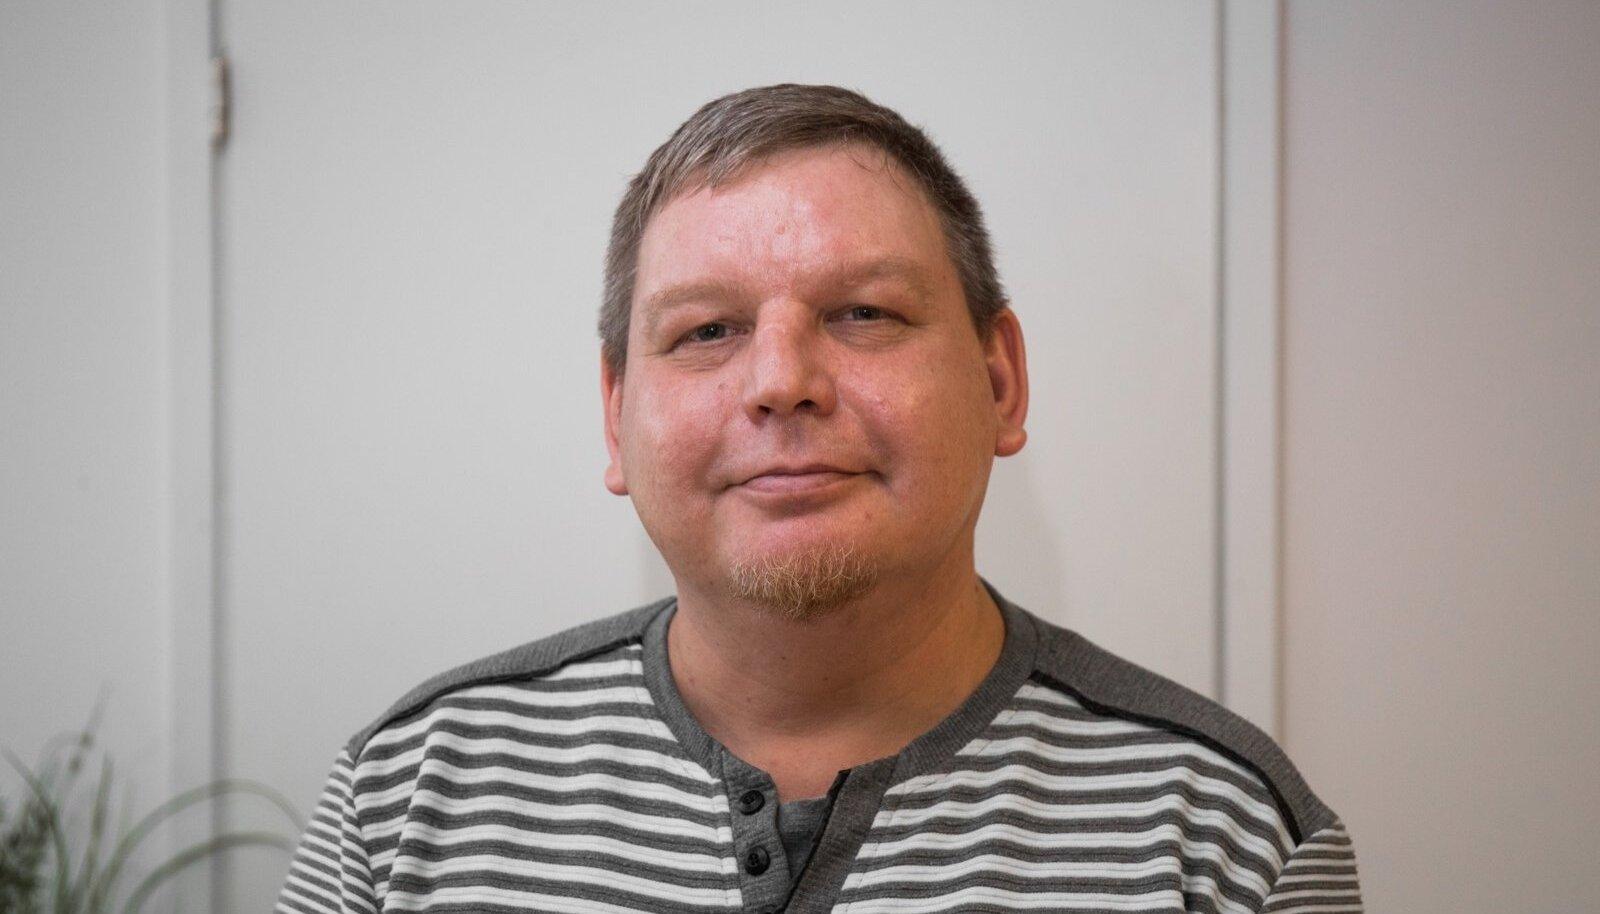 Vadim Štepa